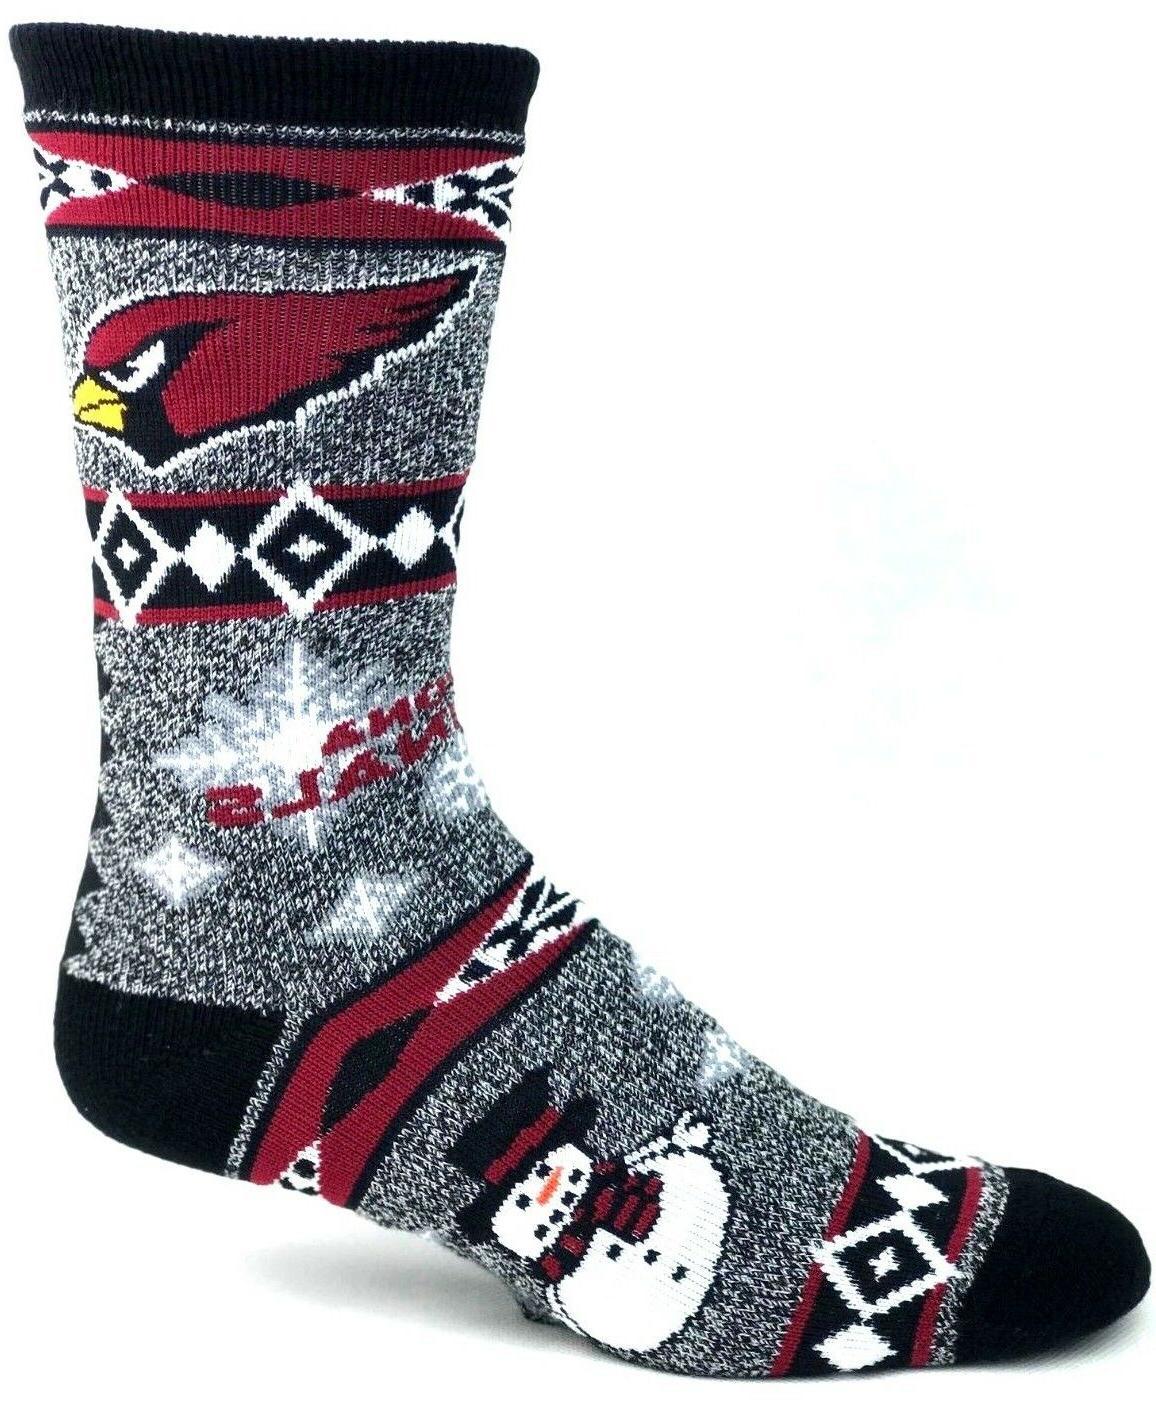 arizona cardinals football ugly holiday snowman sweater